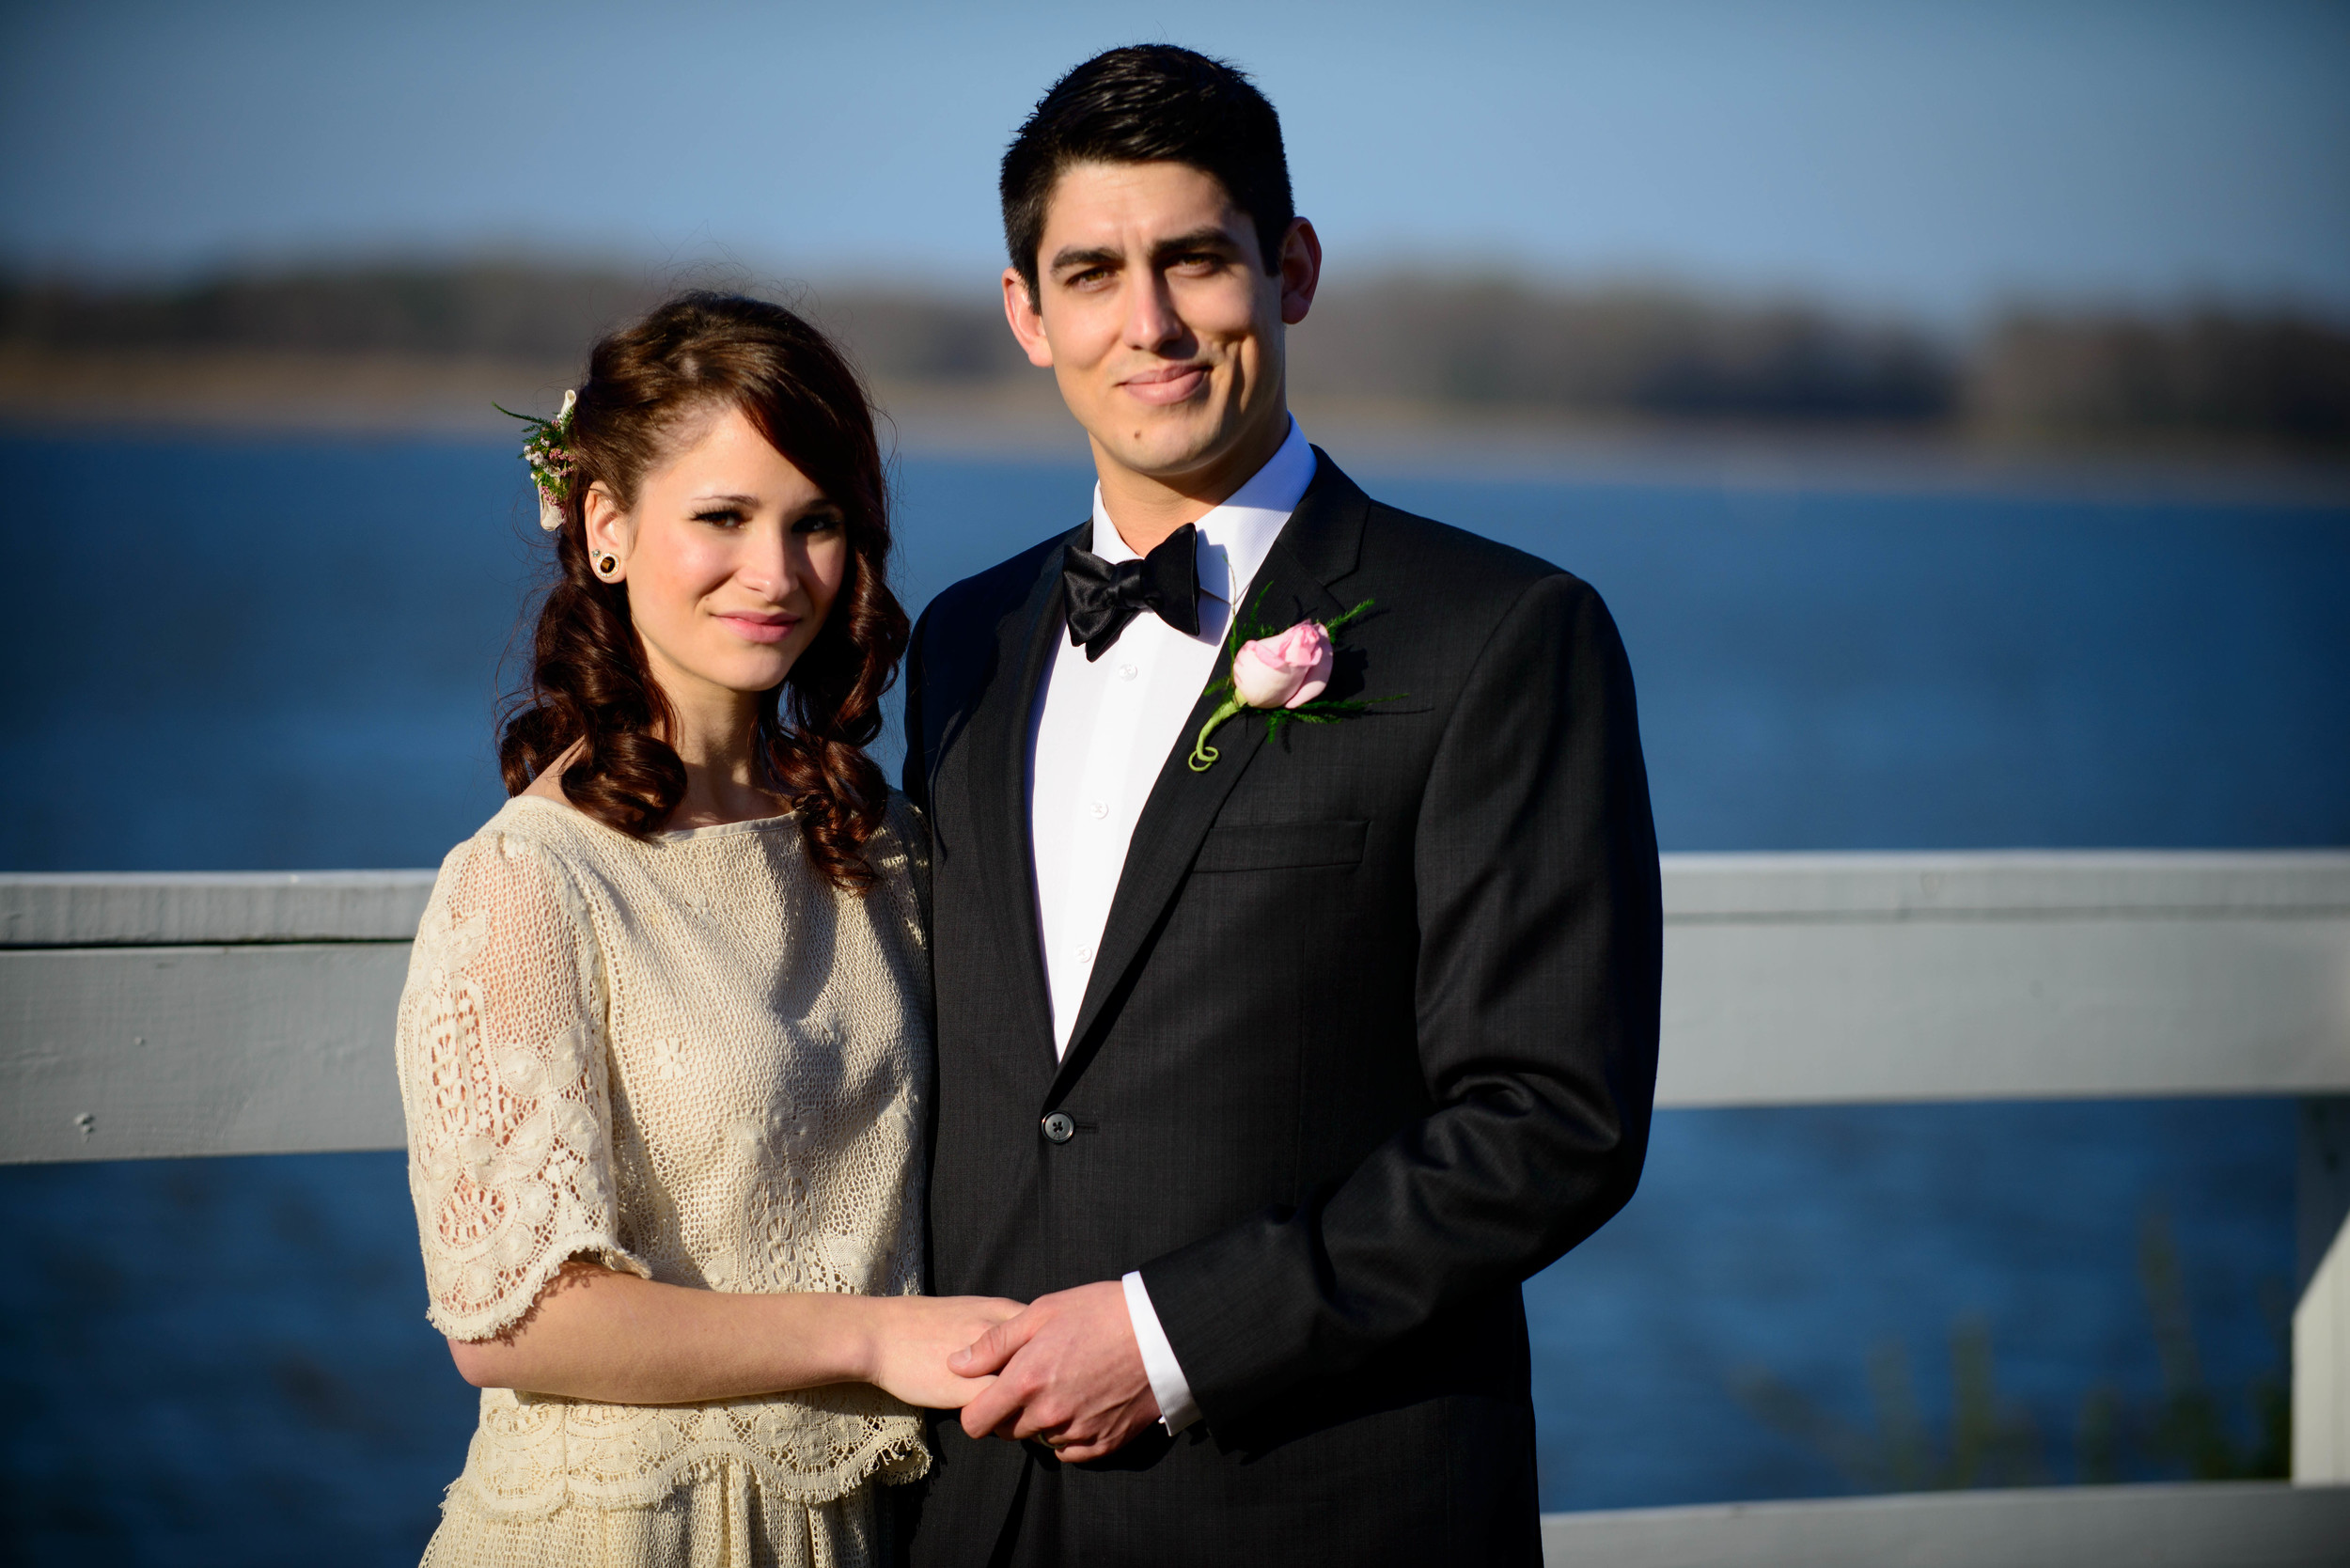 richmond-wedding-photography-26.jpg